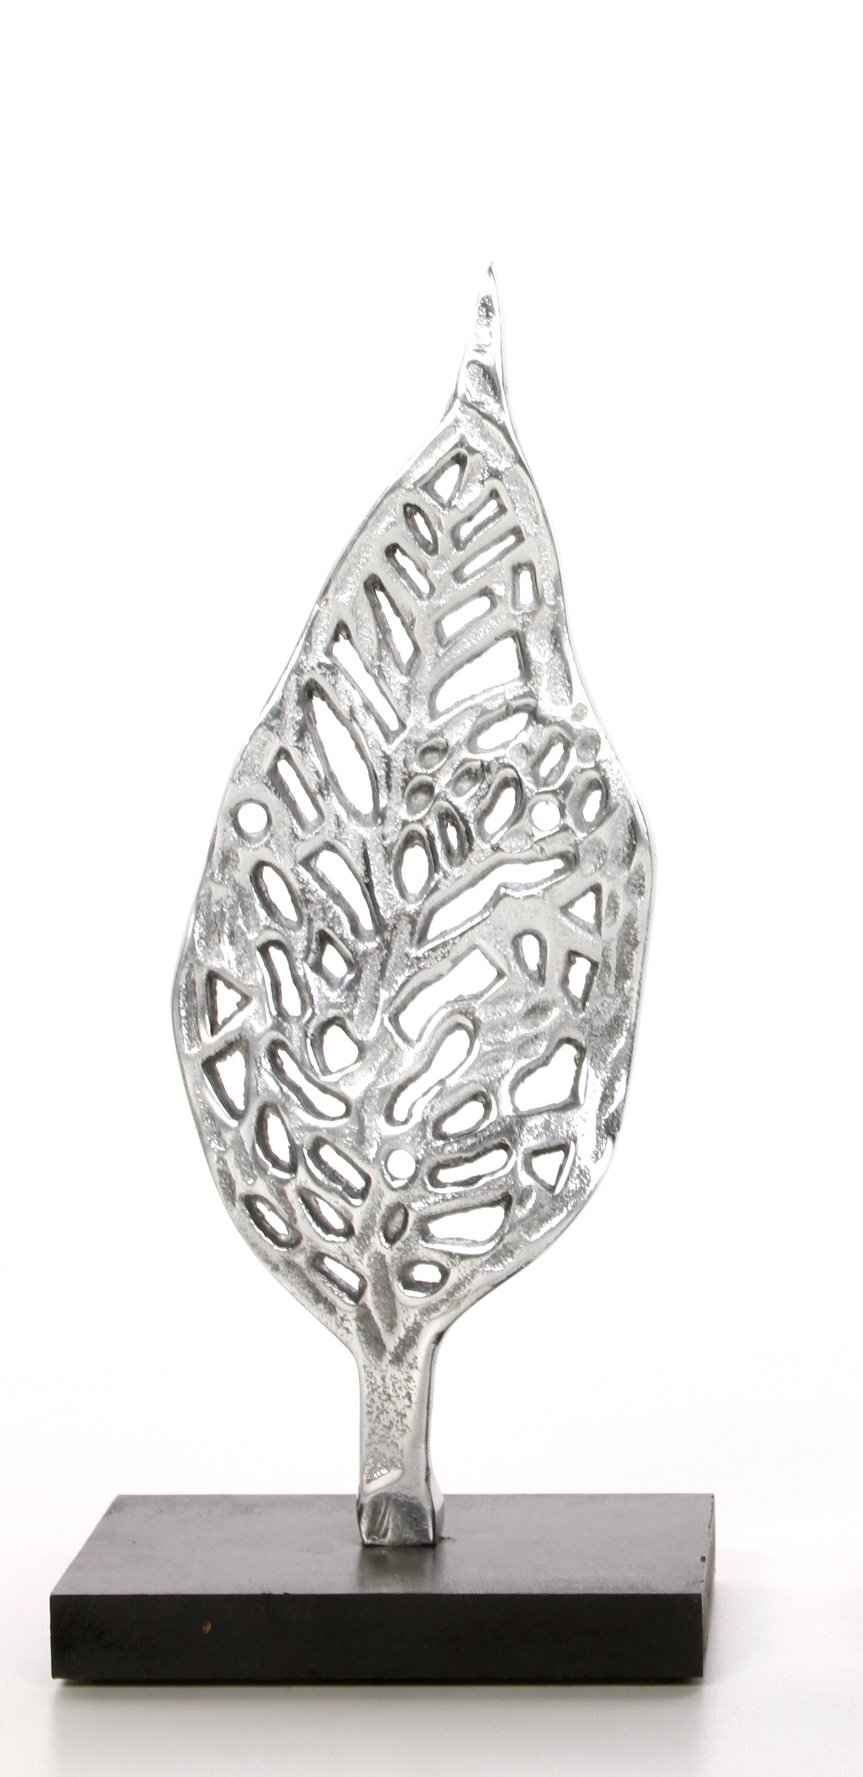 Hosley Decorative Tabletop Leaf Pedestal- Small. Ideal Gift for Wedding, Home, Party Favor, Spa, Reiki, Meditation, Bathroom Settings O9